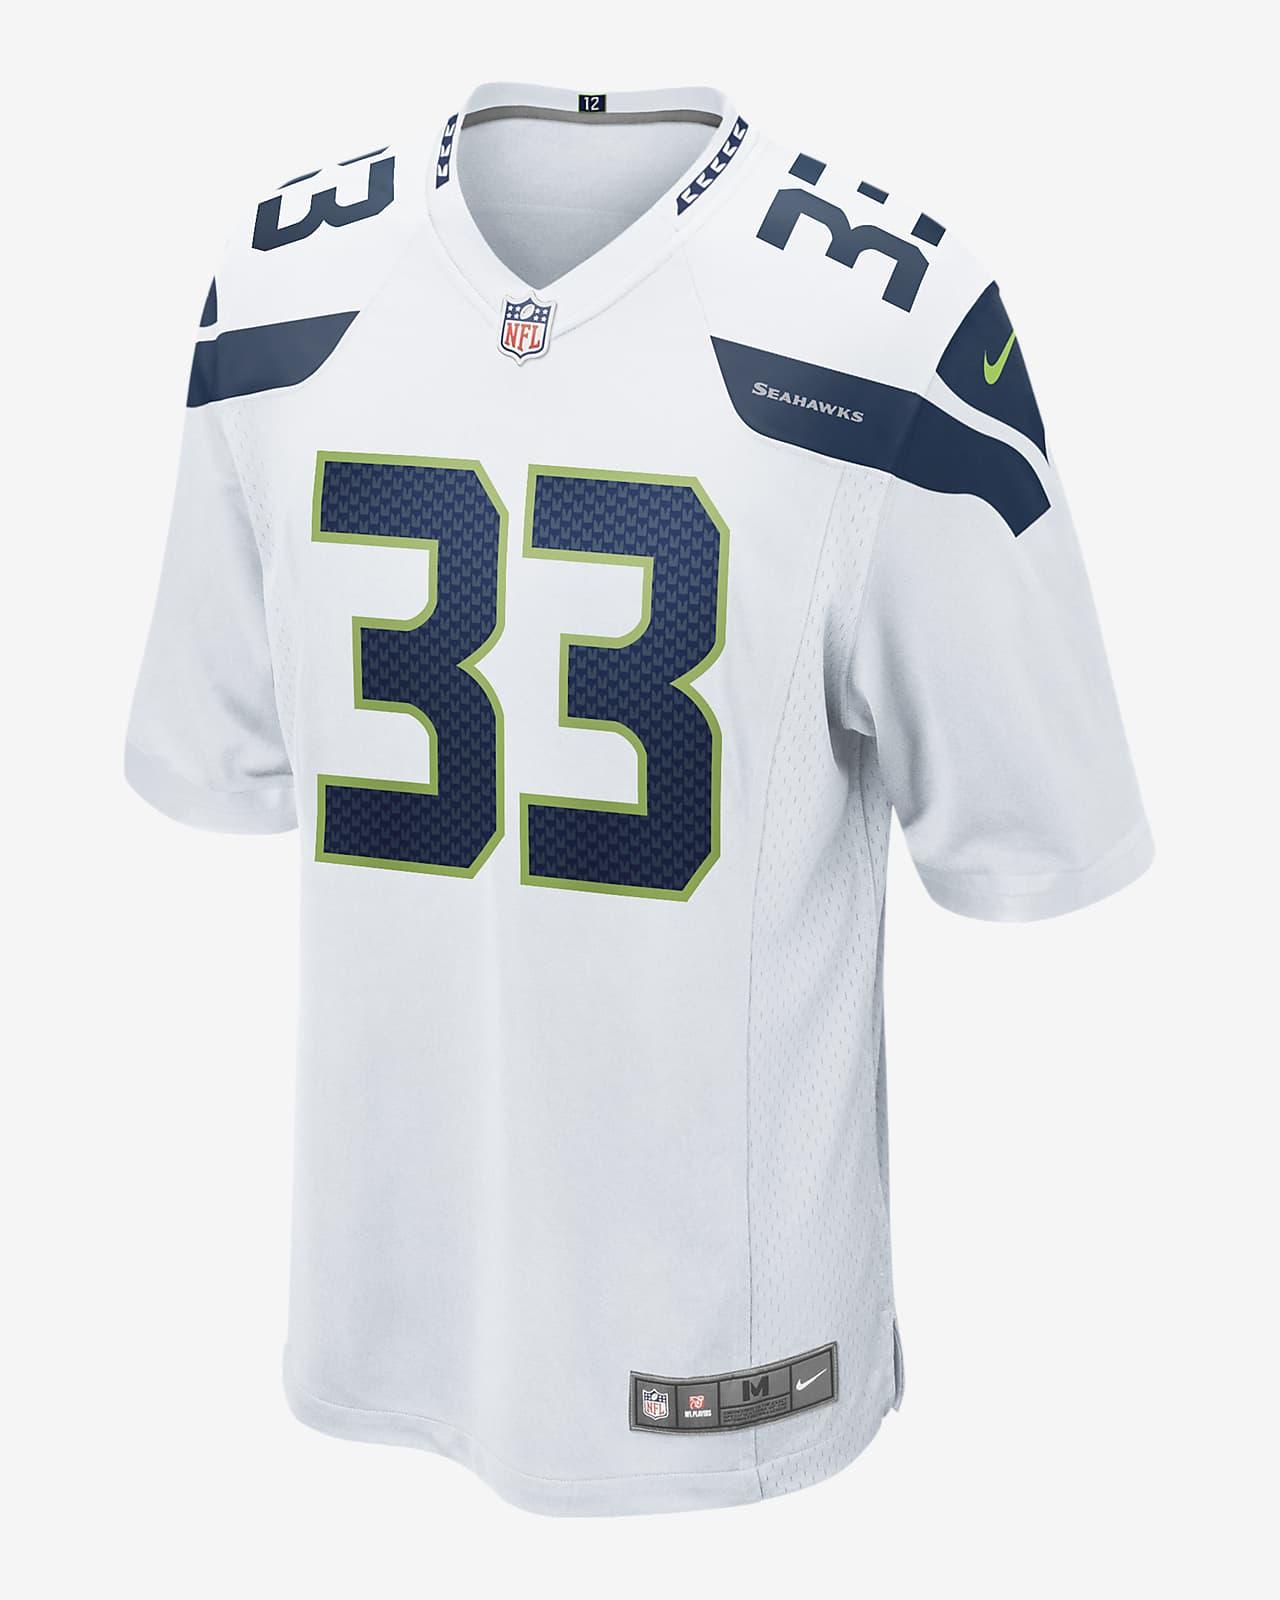 NFL Seattle Seahawks (Jamal Adams) Men's Game Football Jersey